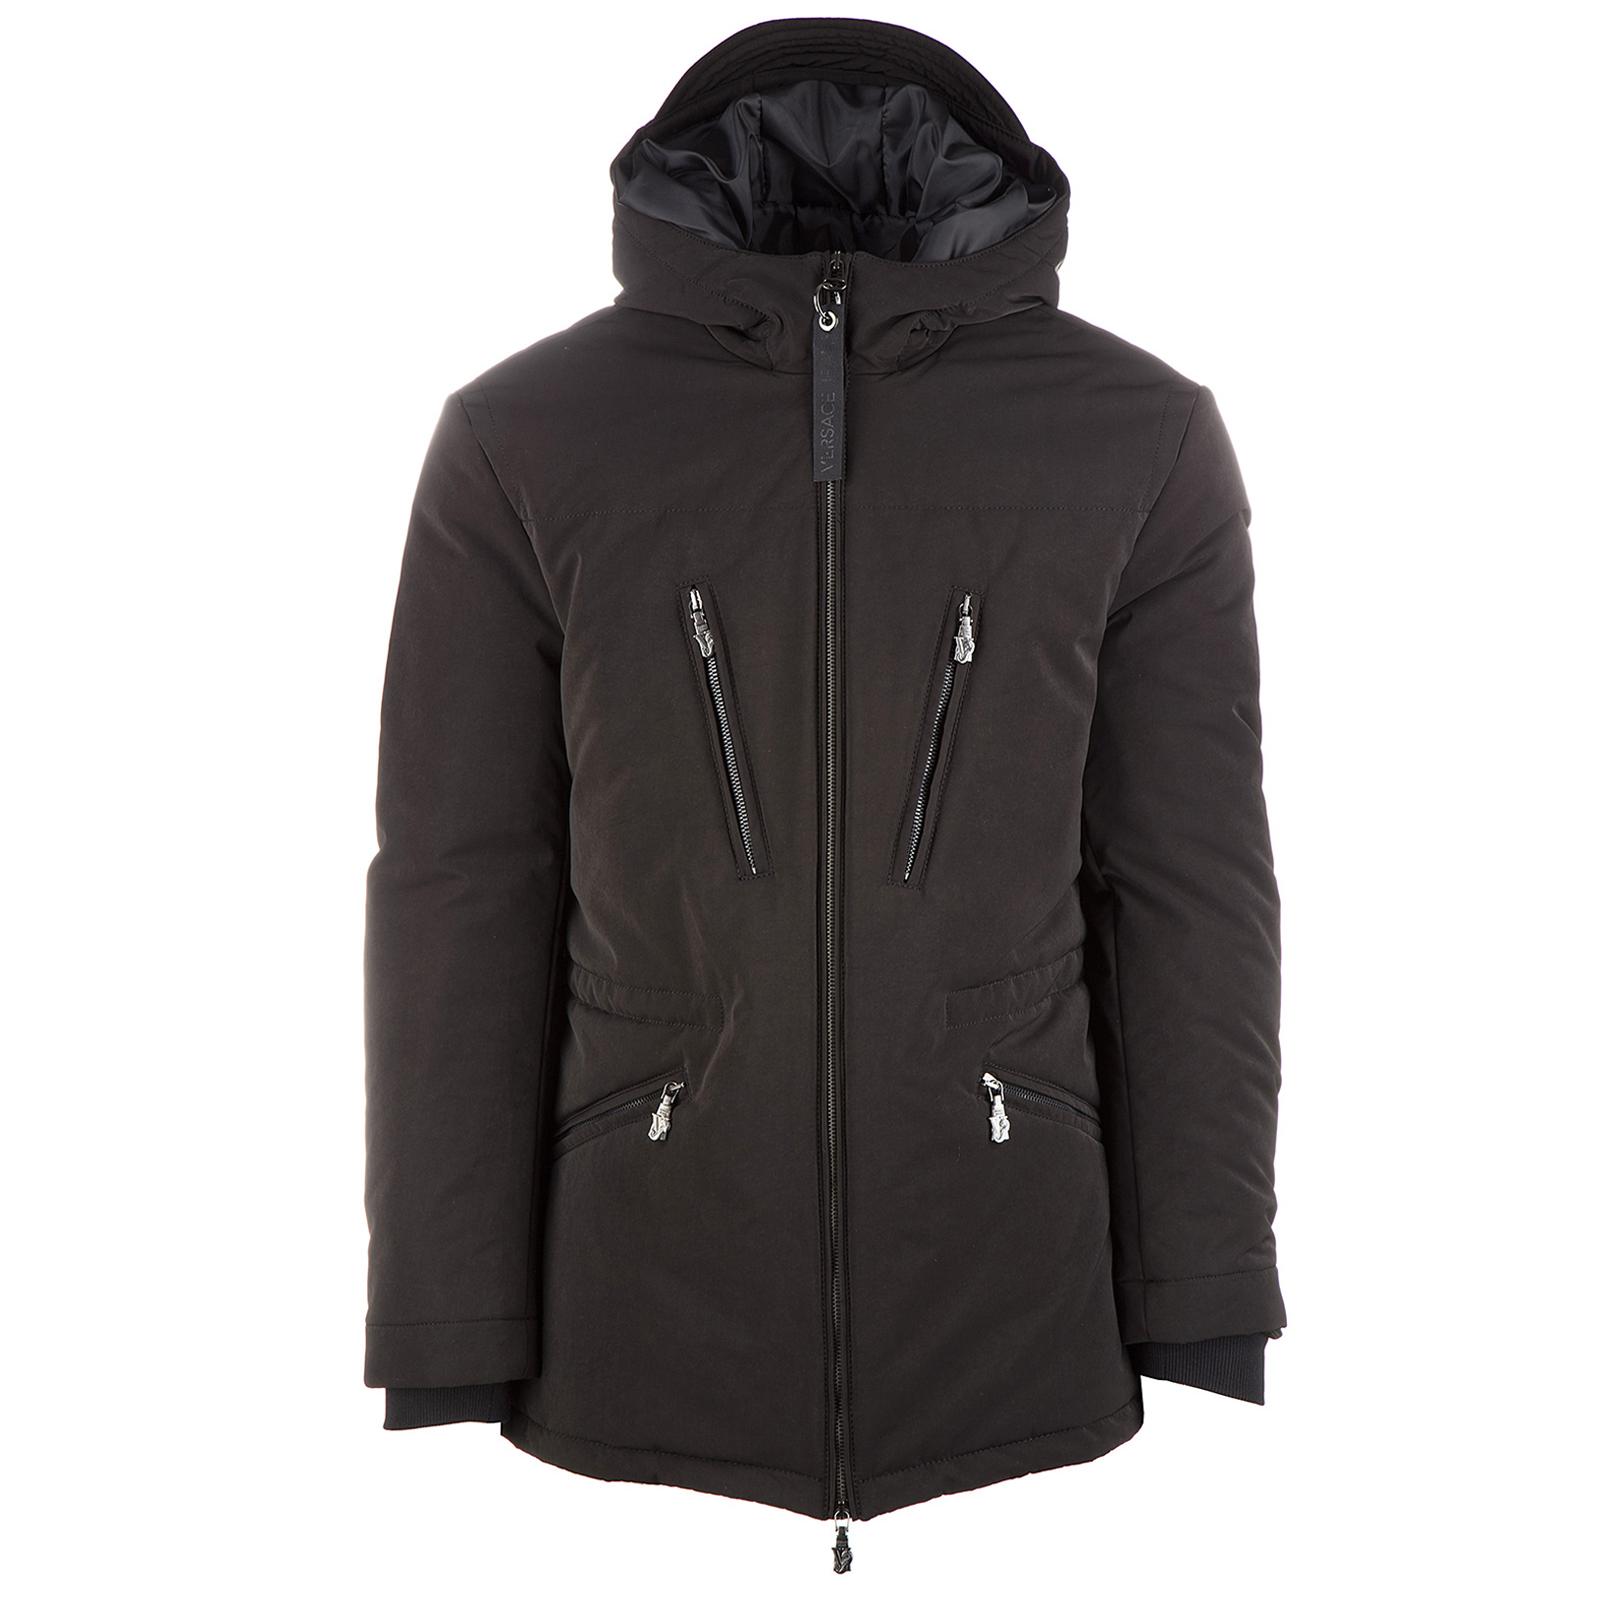 Piumino куртка мужская tatt pl frosted regular